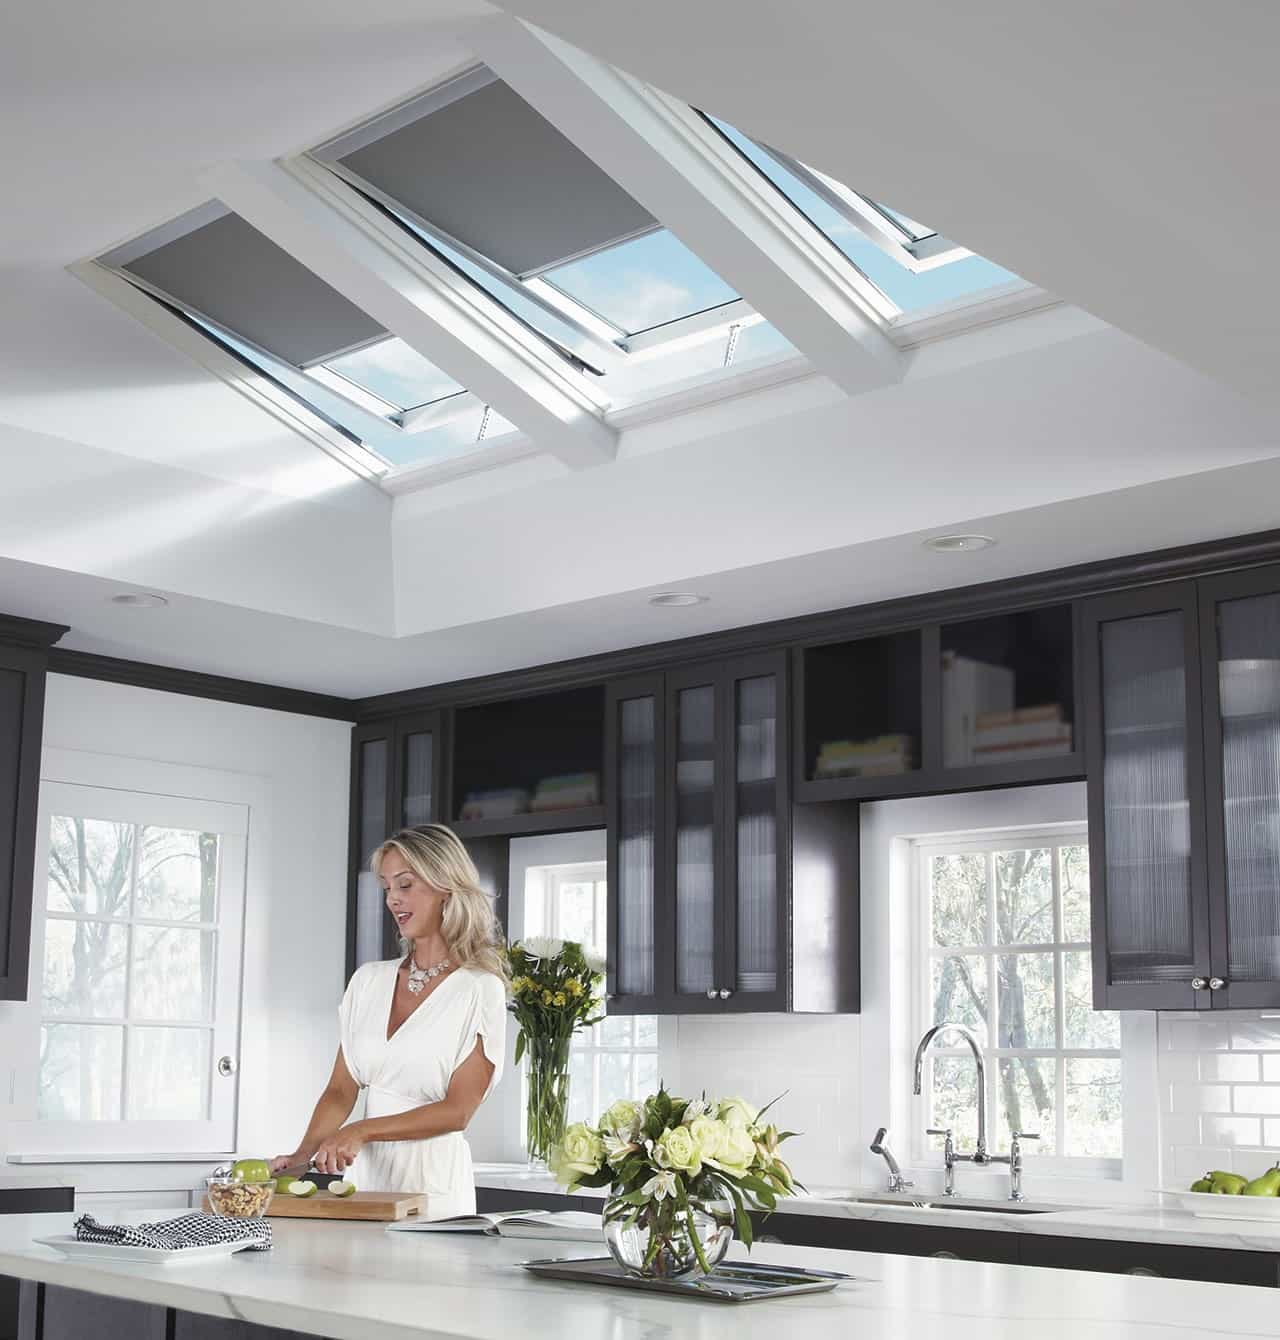 Modern Solar Blockout Blinds For Modern Kitchen Interior (View 6 of 25)